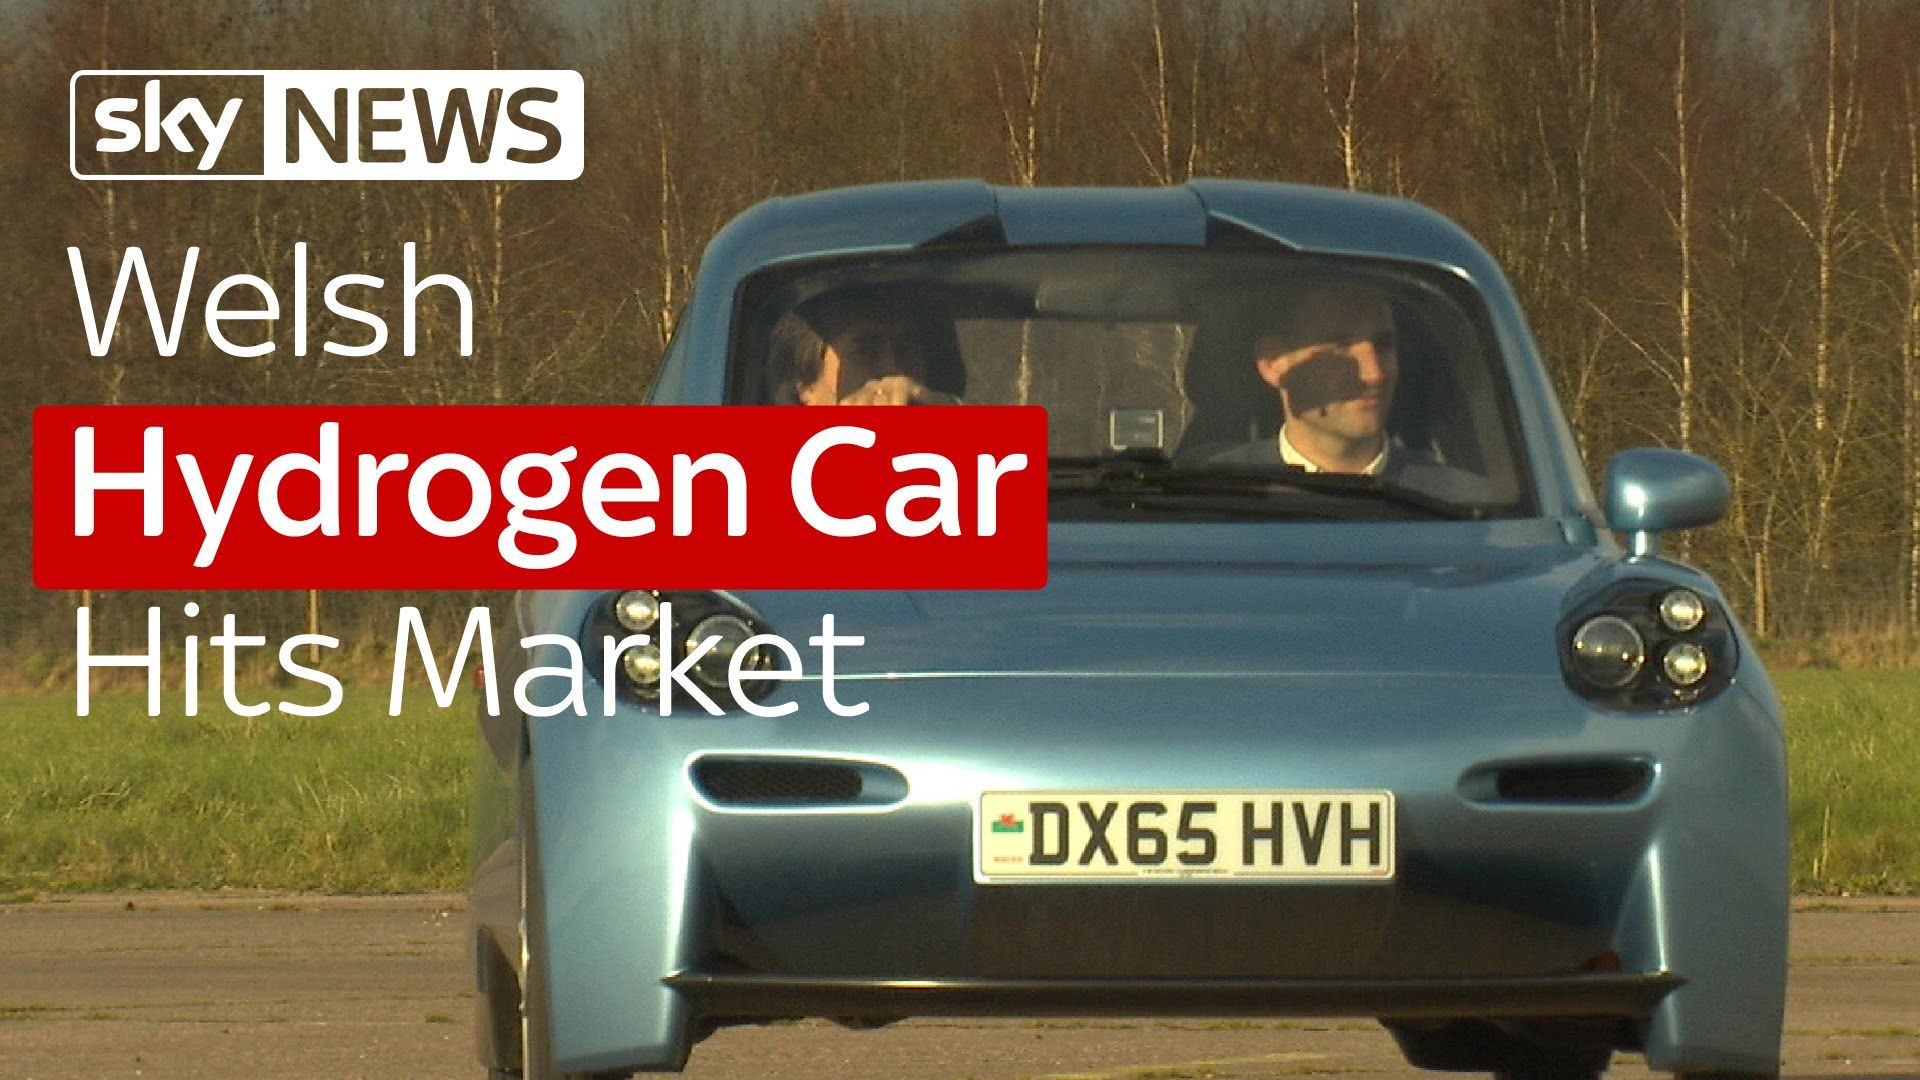 Welsh Hydrogen Car Hits Market Hydrogen car, Car, Marketing